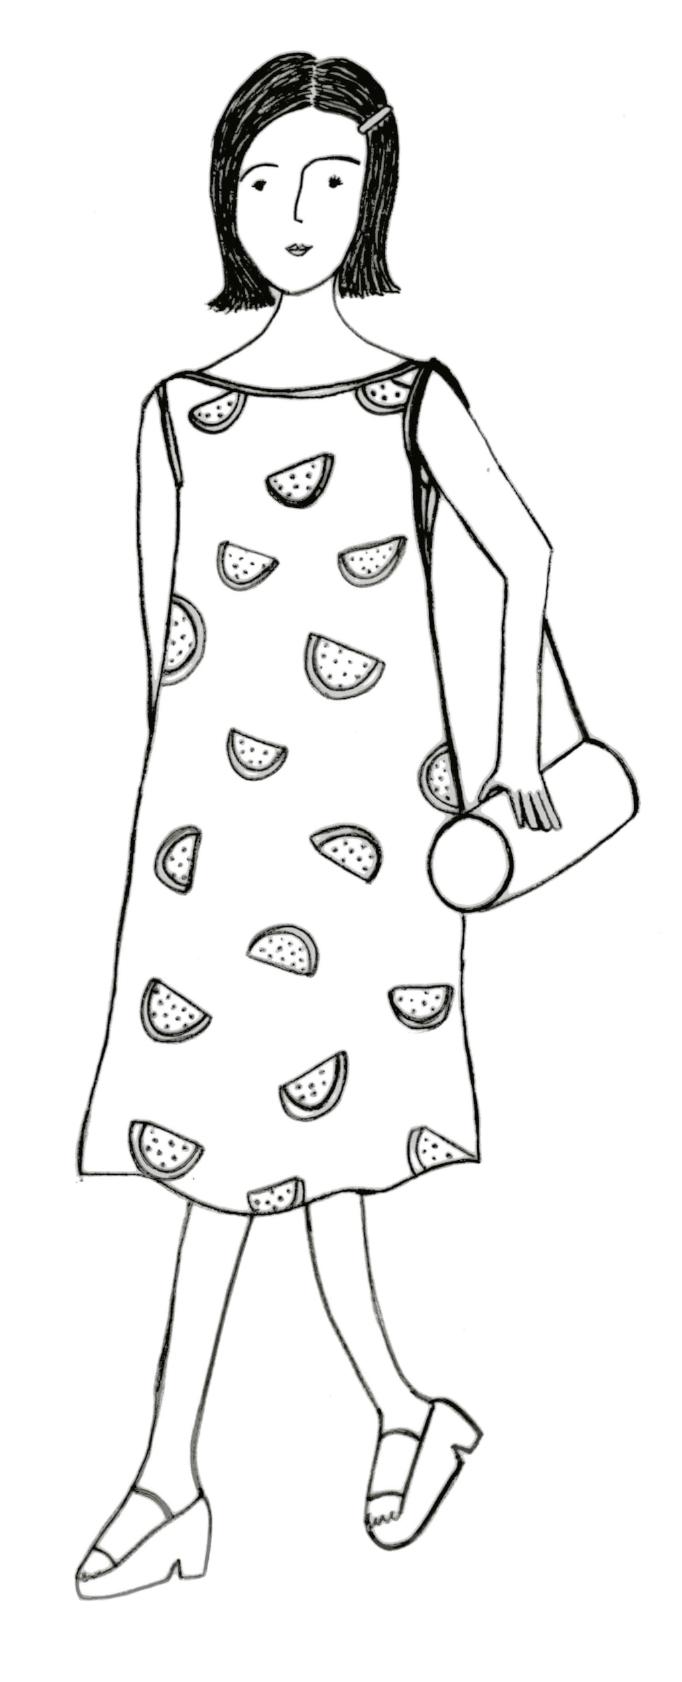 woman with watermelondress .jpg